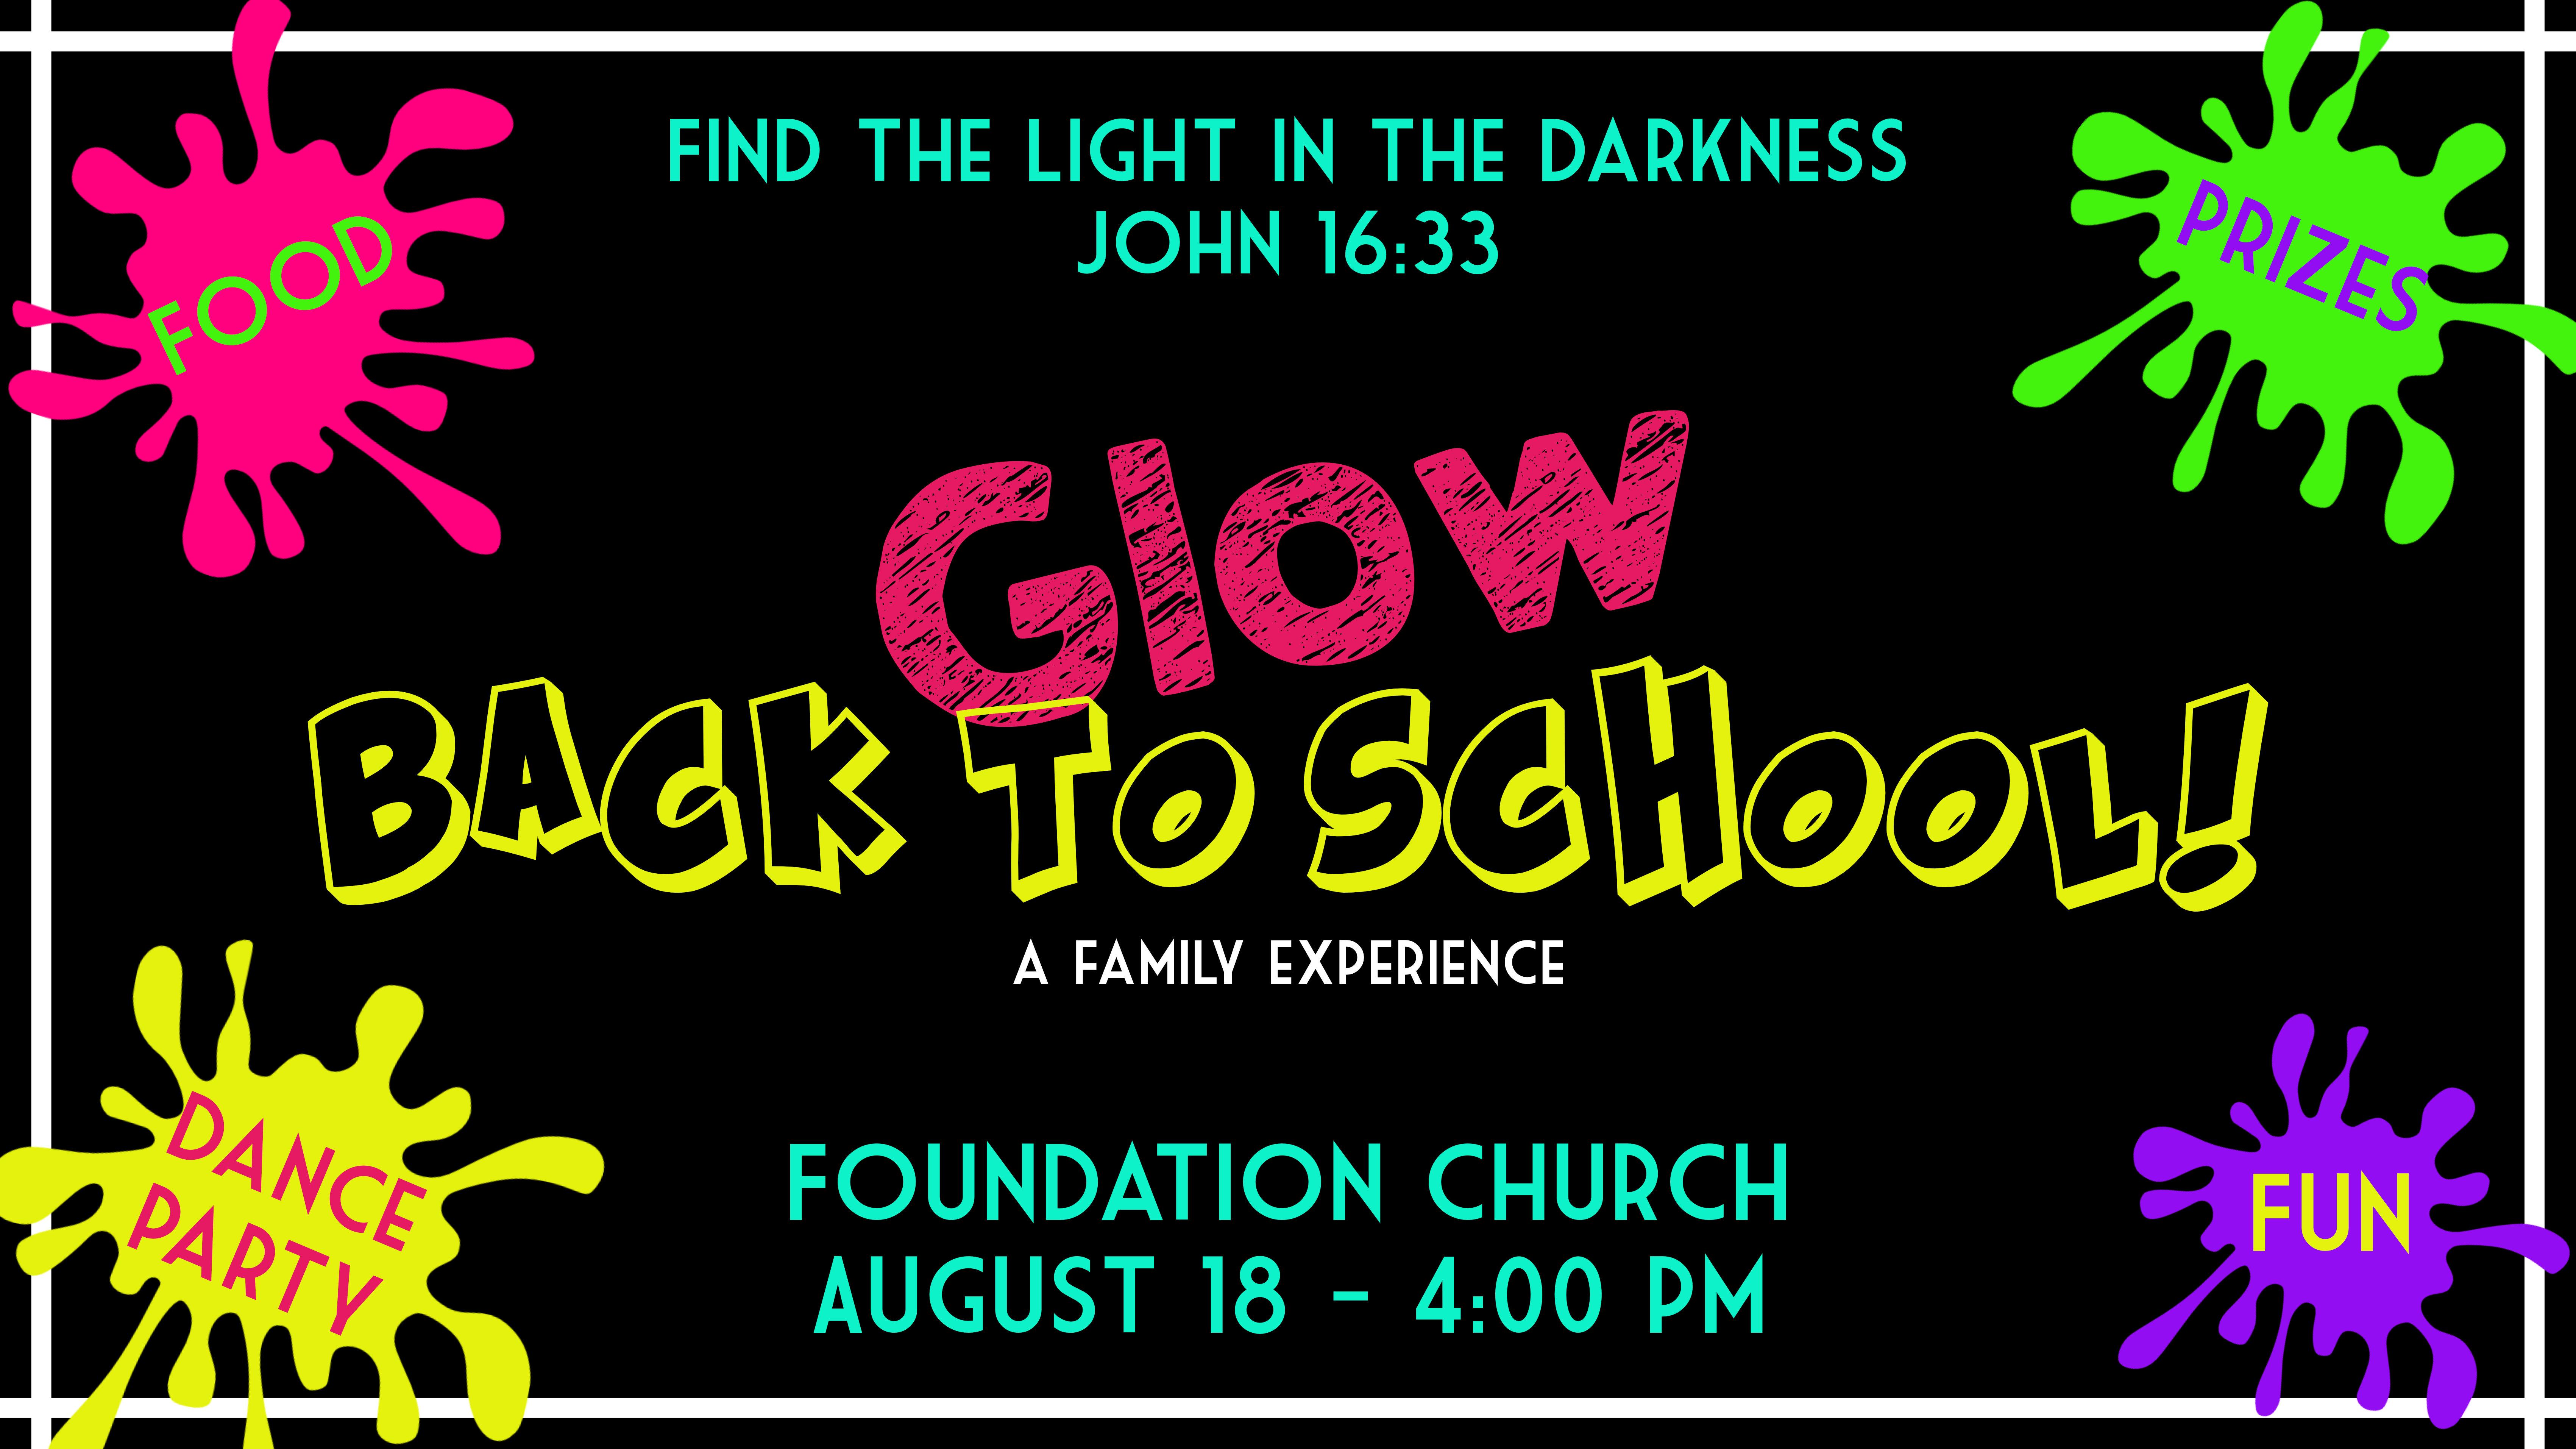 Foundation Church Glow Back To School